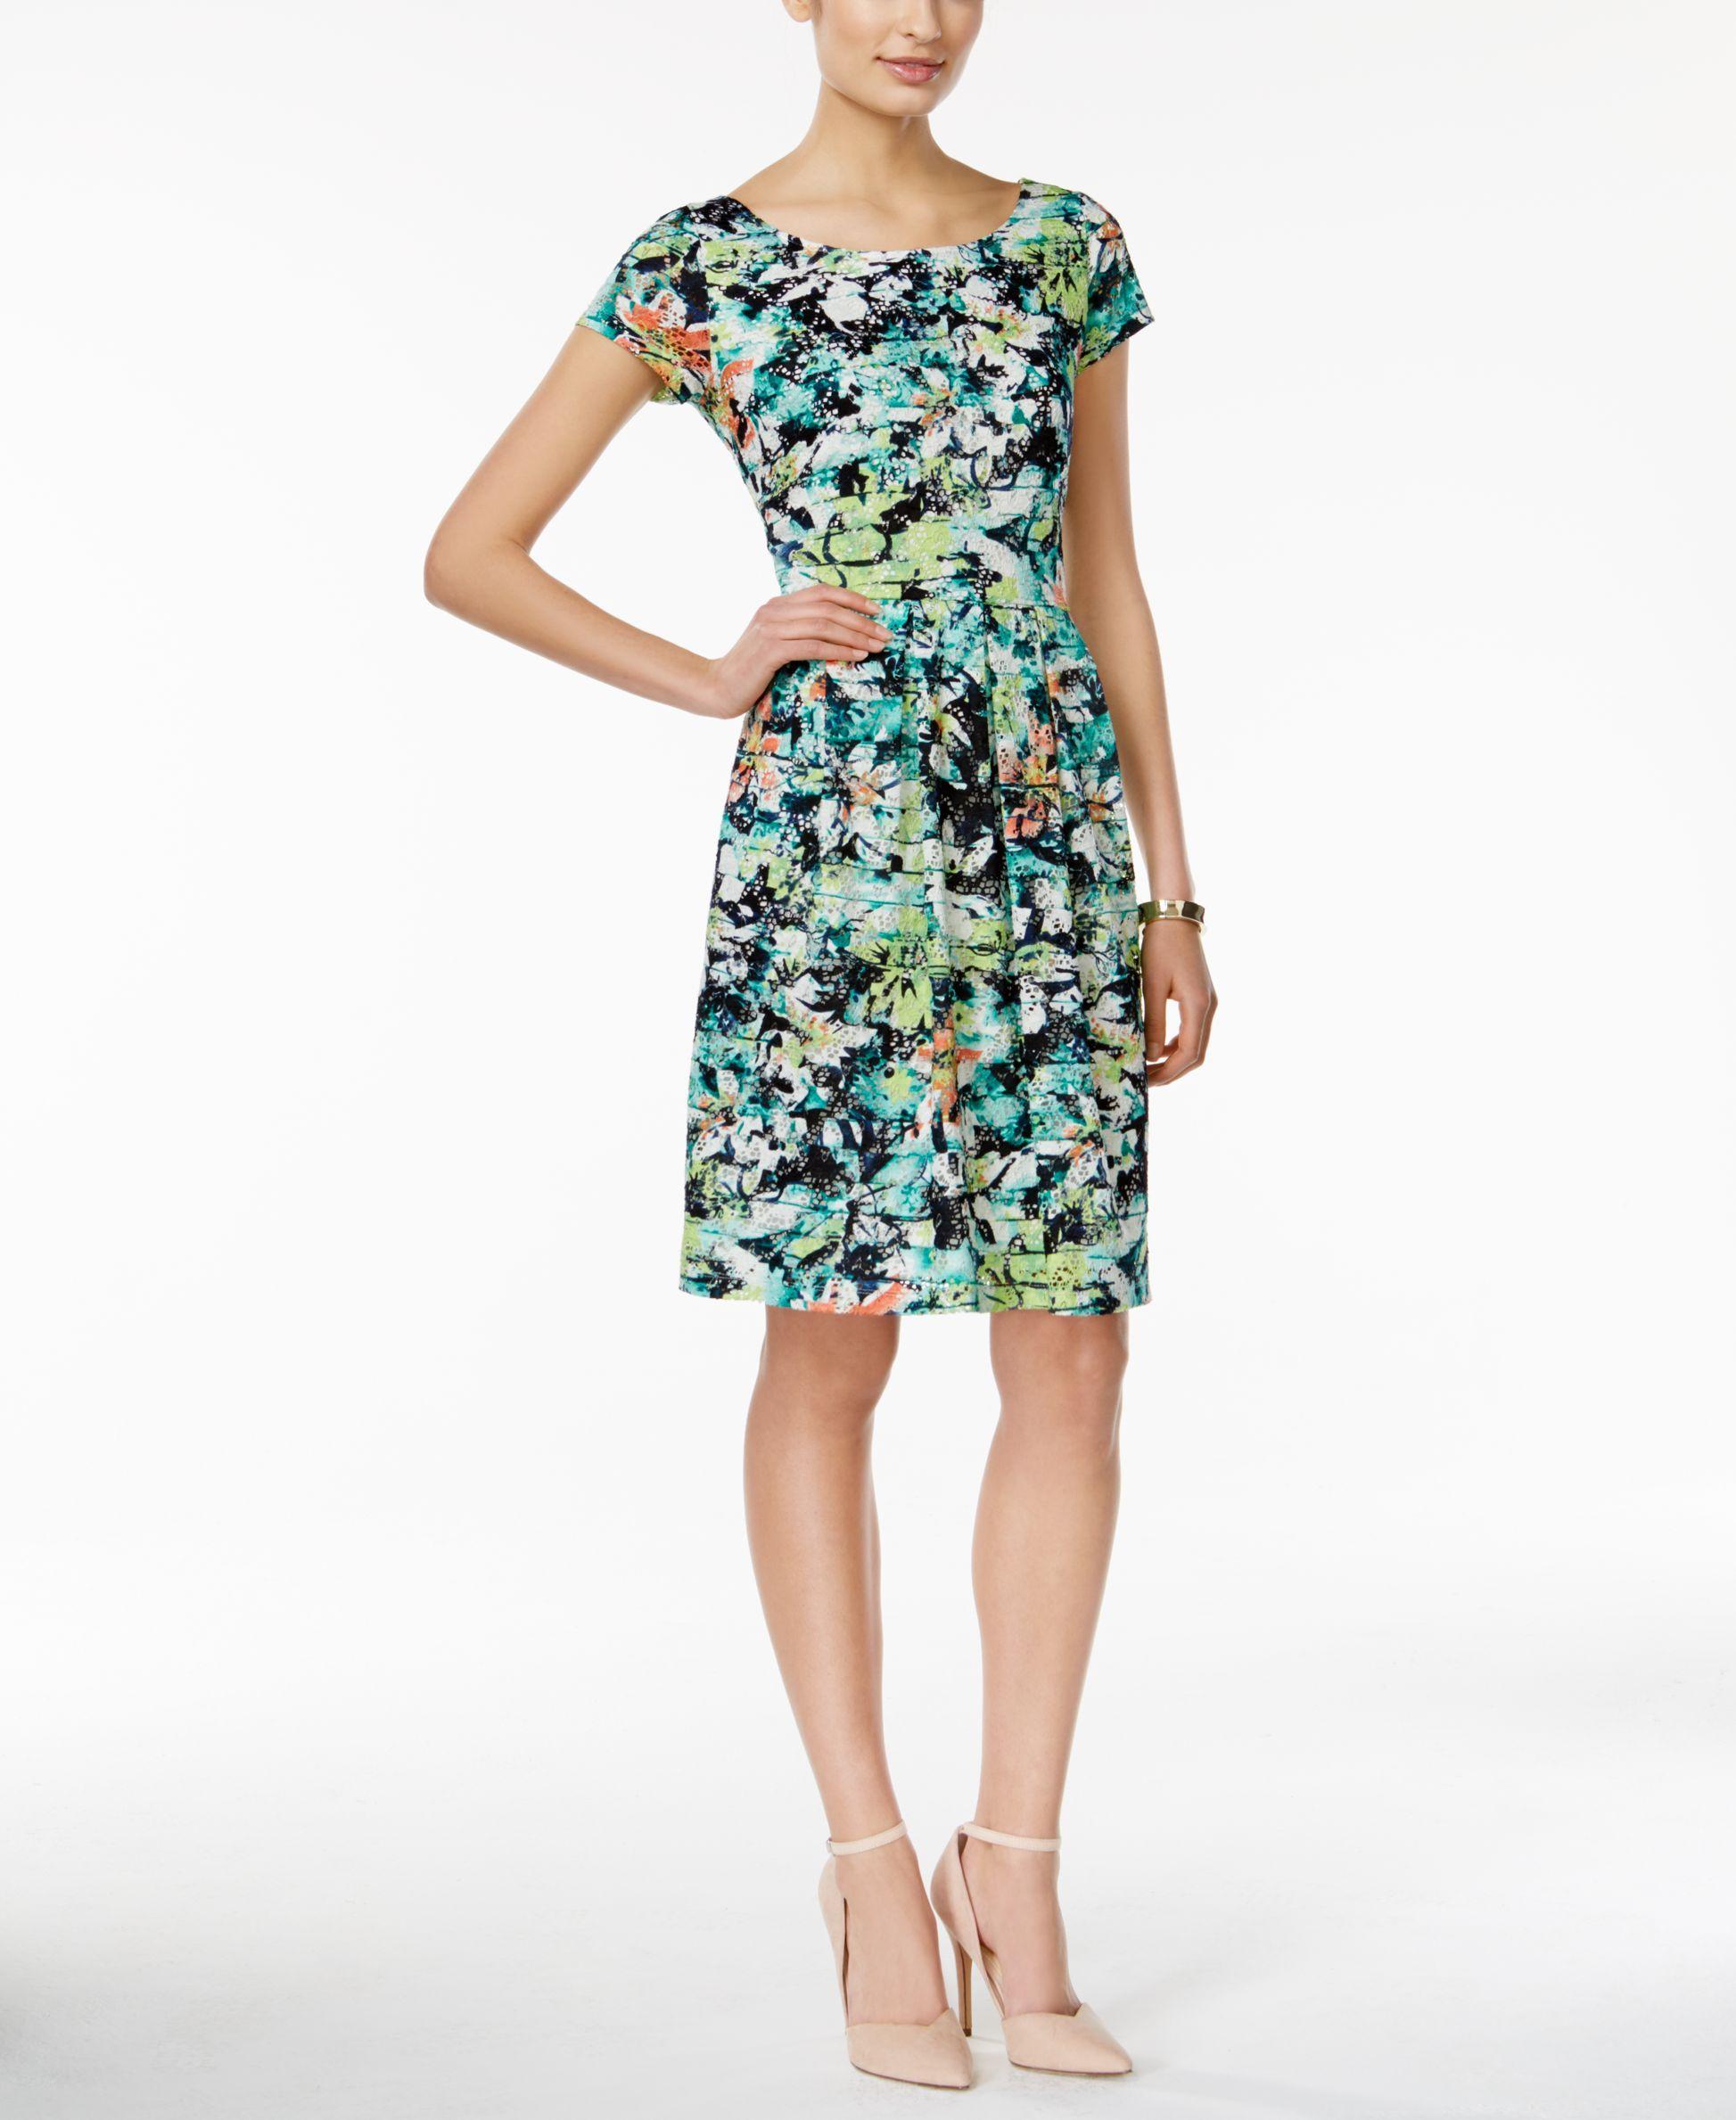 Ronni nicole capsleeve printed lace aline dress